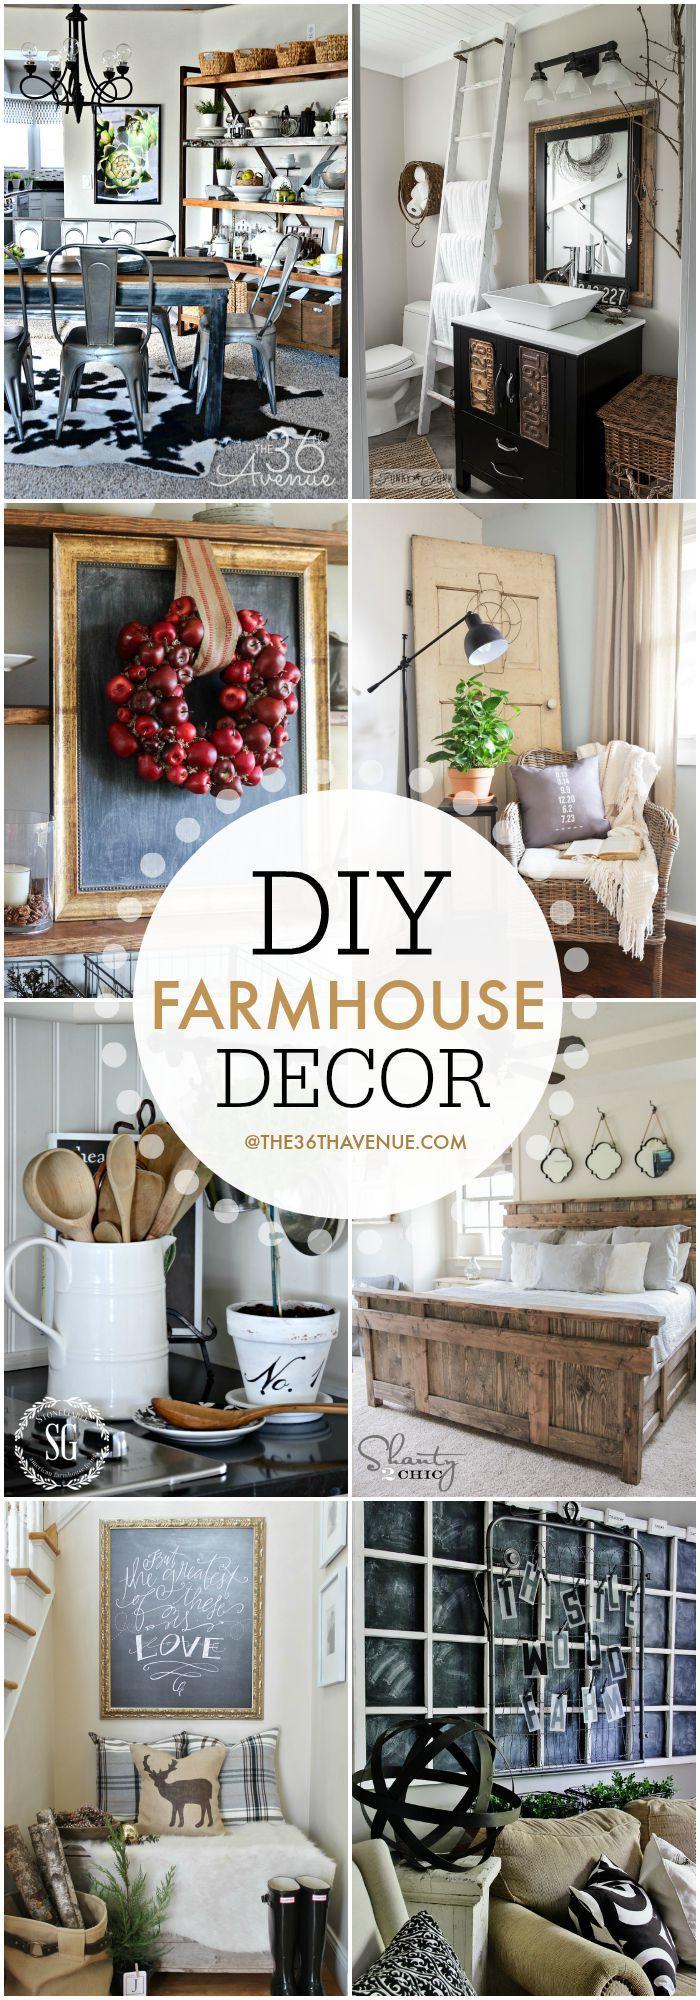 Farmhouse Home Decor Ideas | Pinterest | Decorating, Create and House